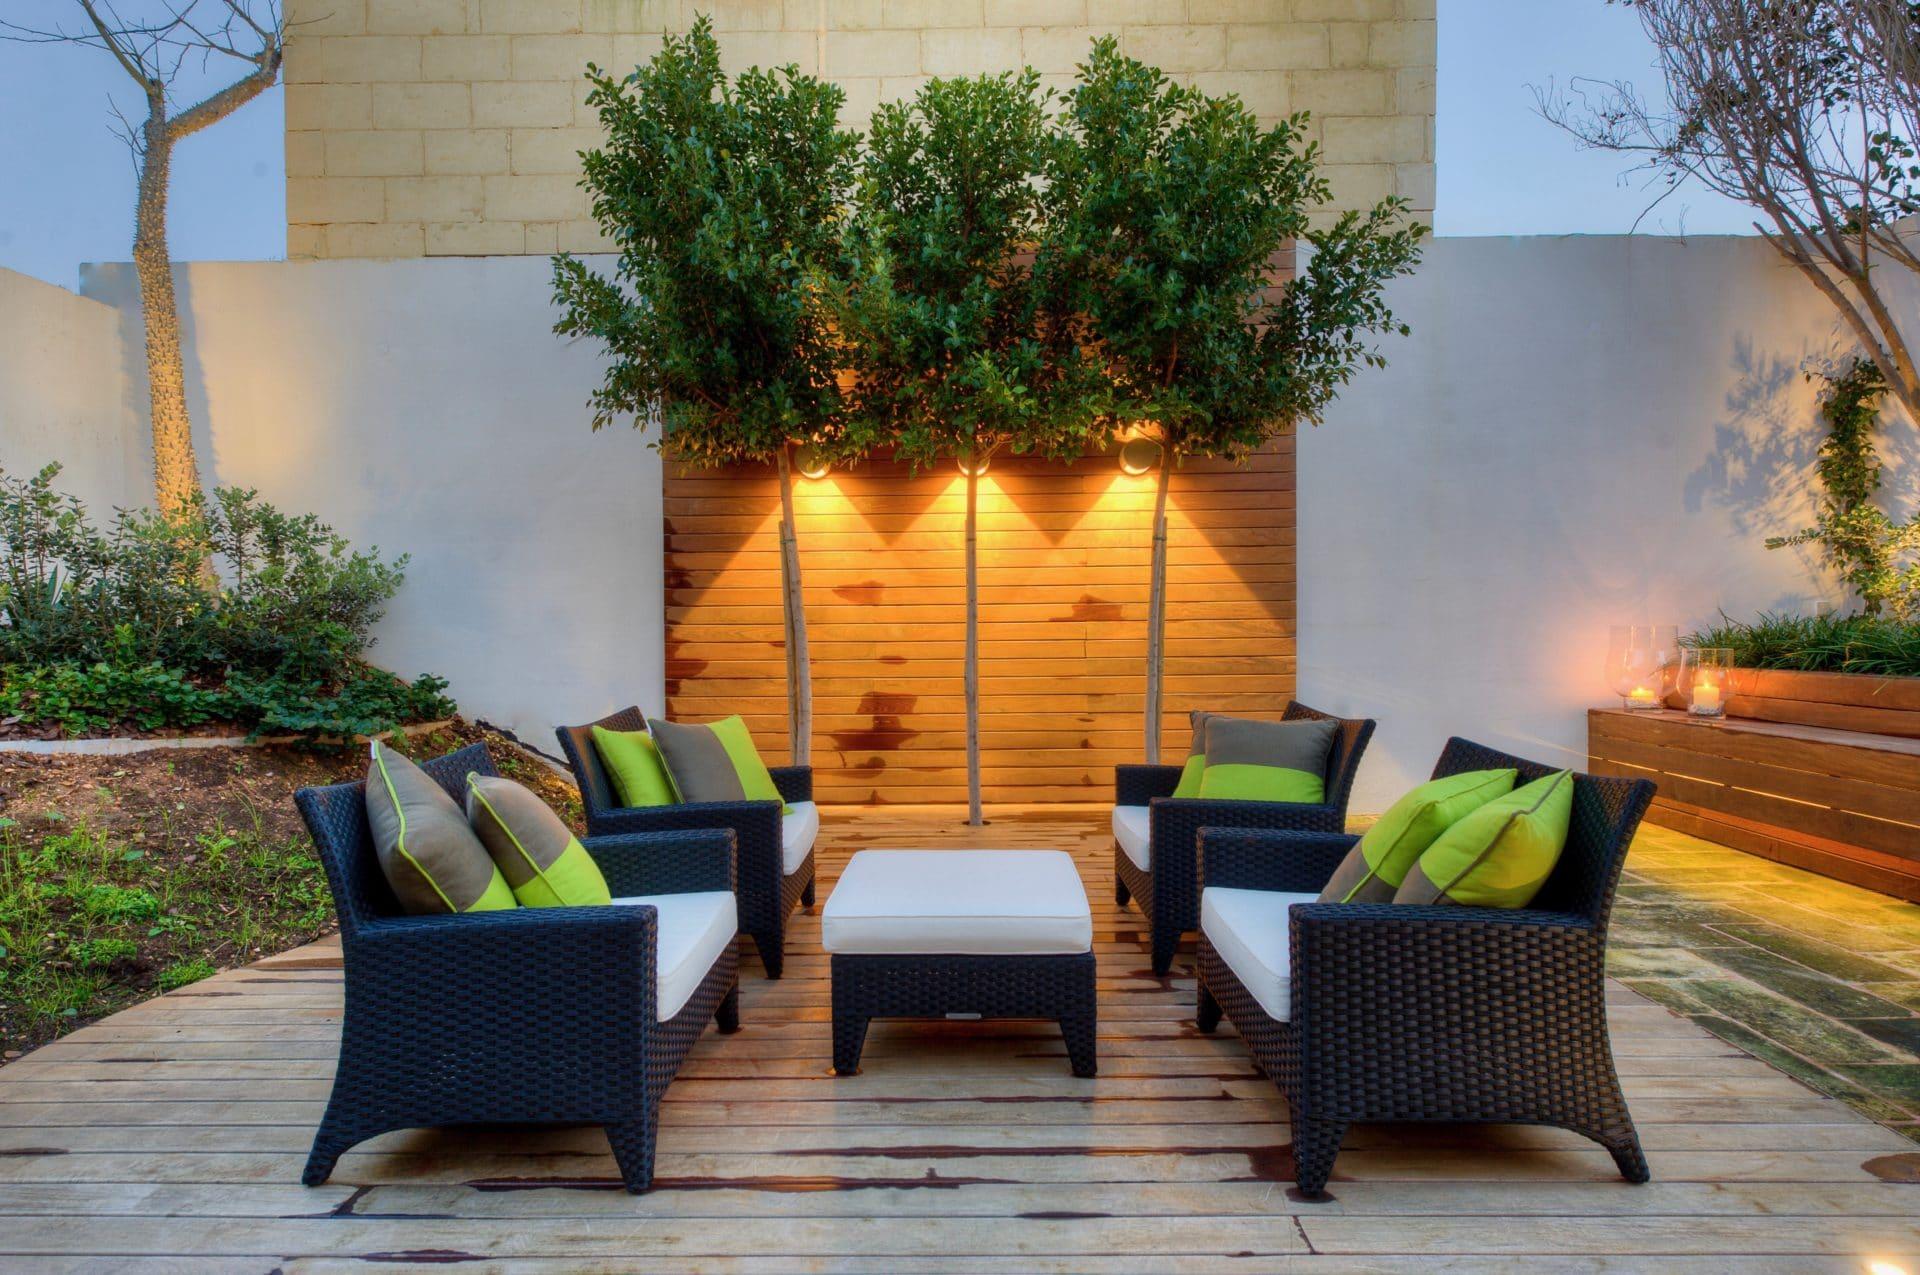 Garden – decking, sitting area, feature lighting